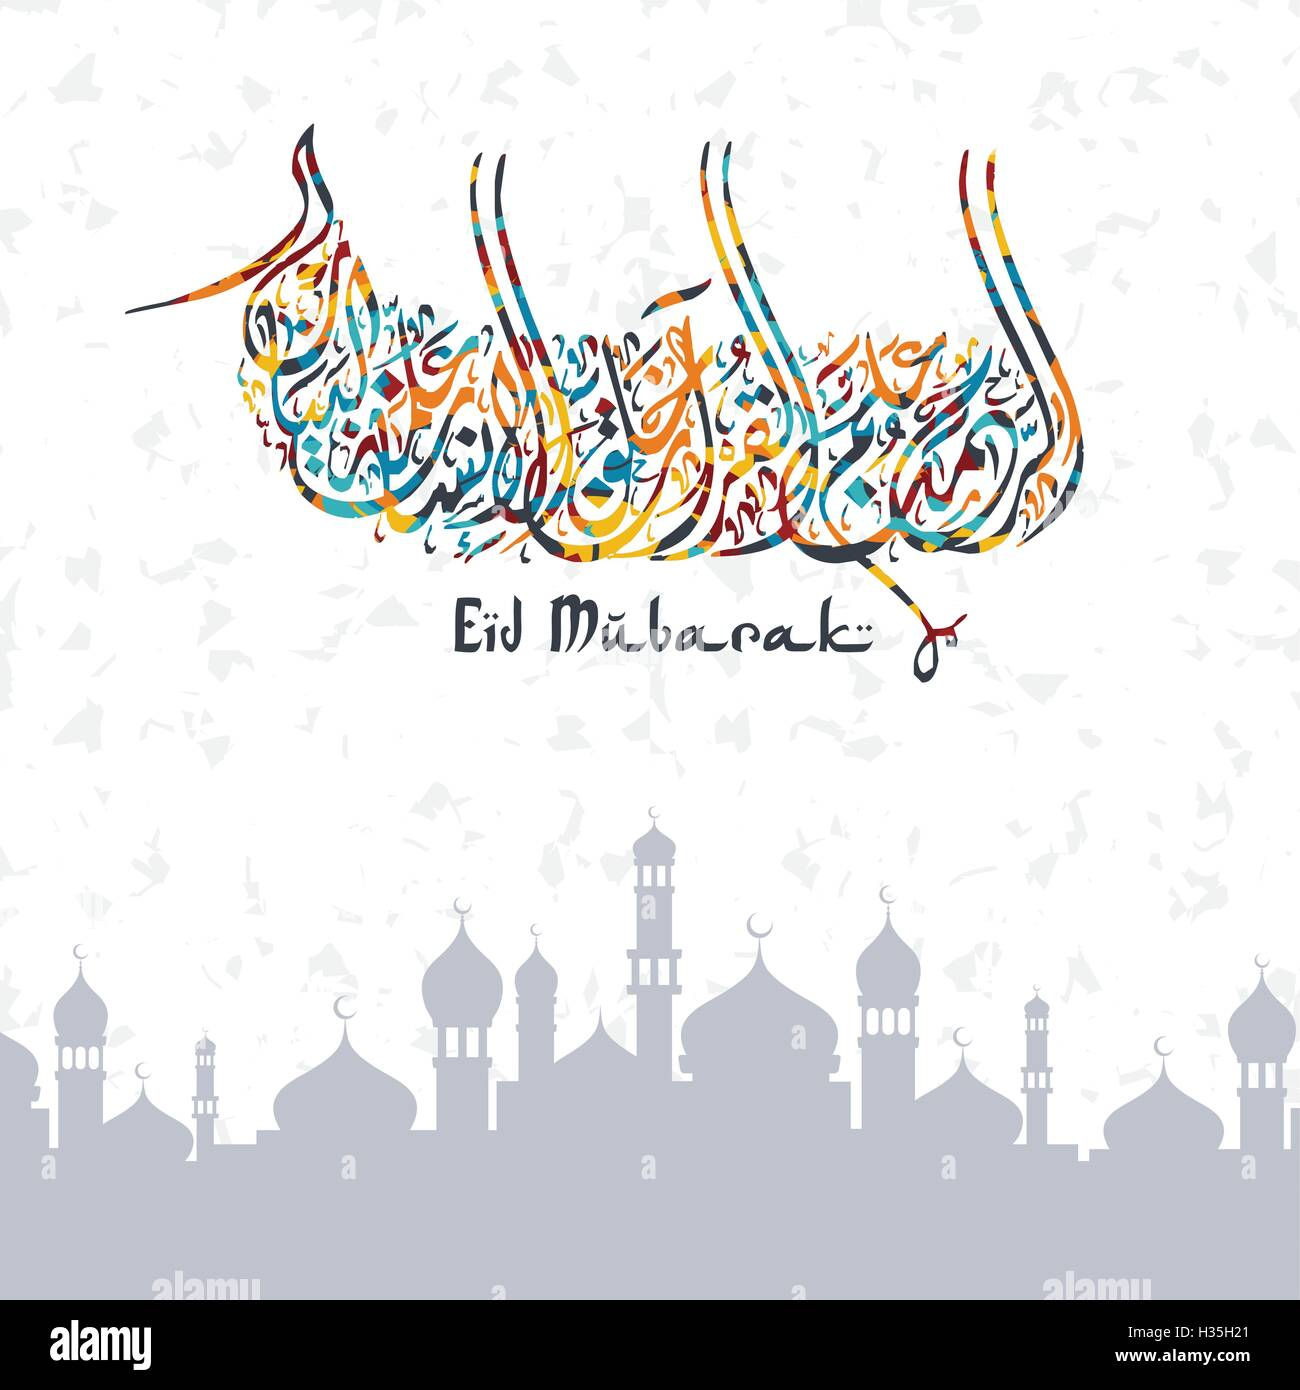 Al text vector stock photos al text vector stock images page 2 happy eid mubarak greetings arabic calligraphy art stock image m4hsunfo